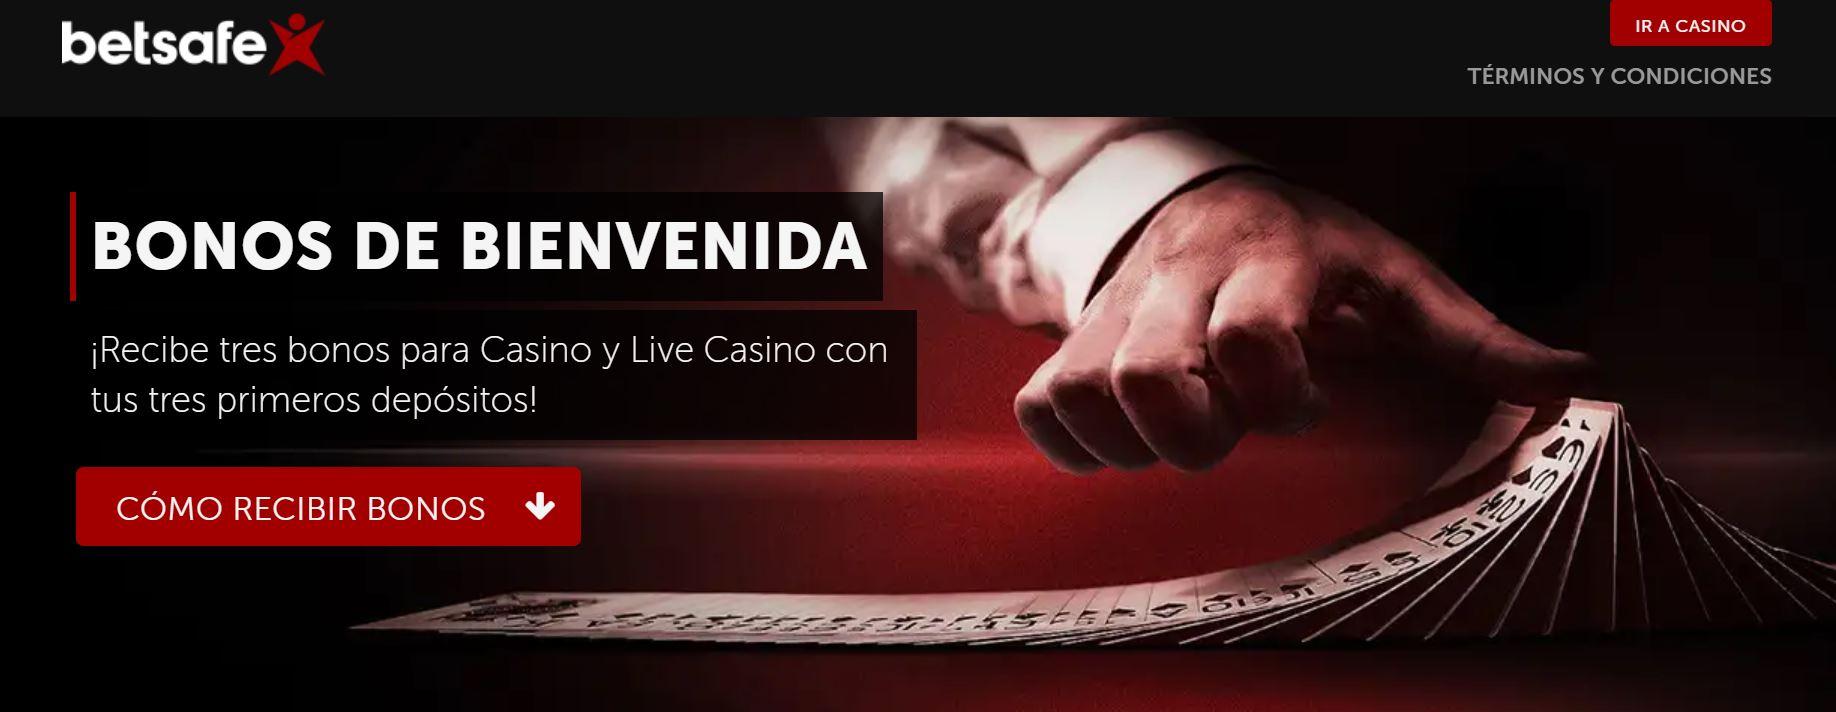 Betsafe bono de bienvenida casino